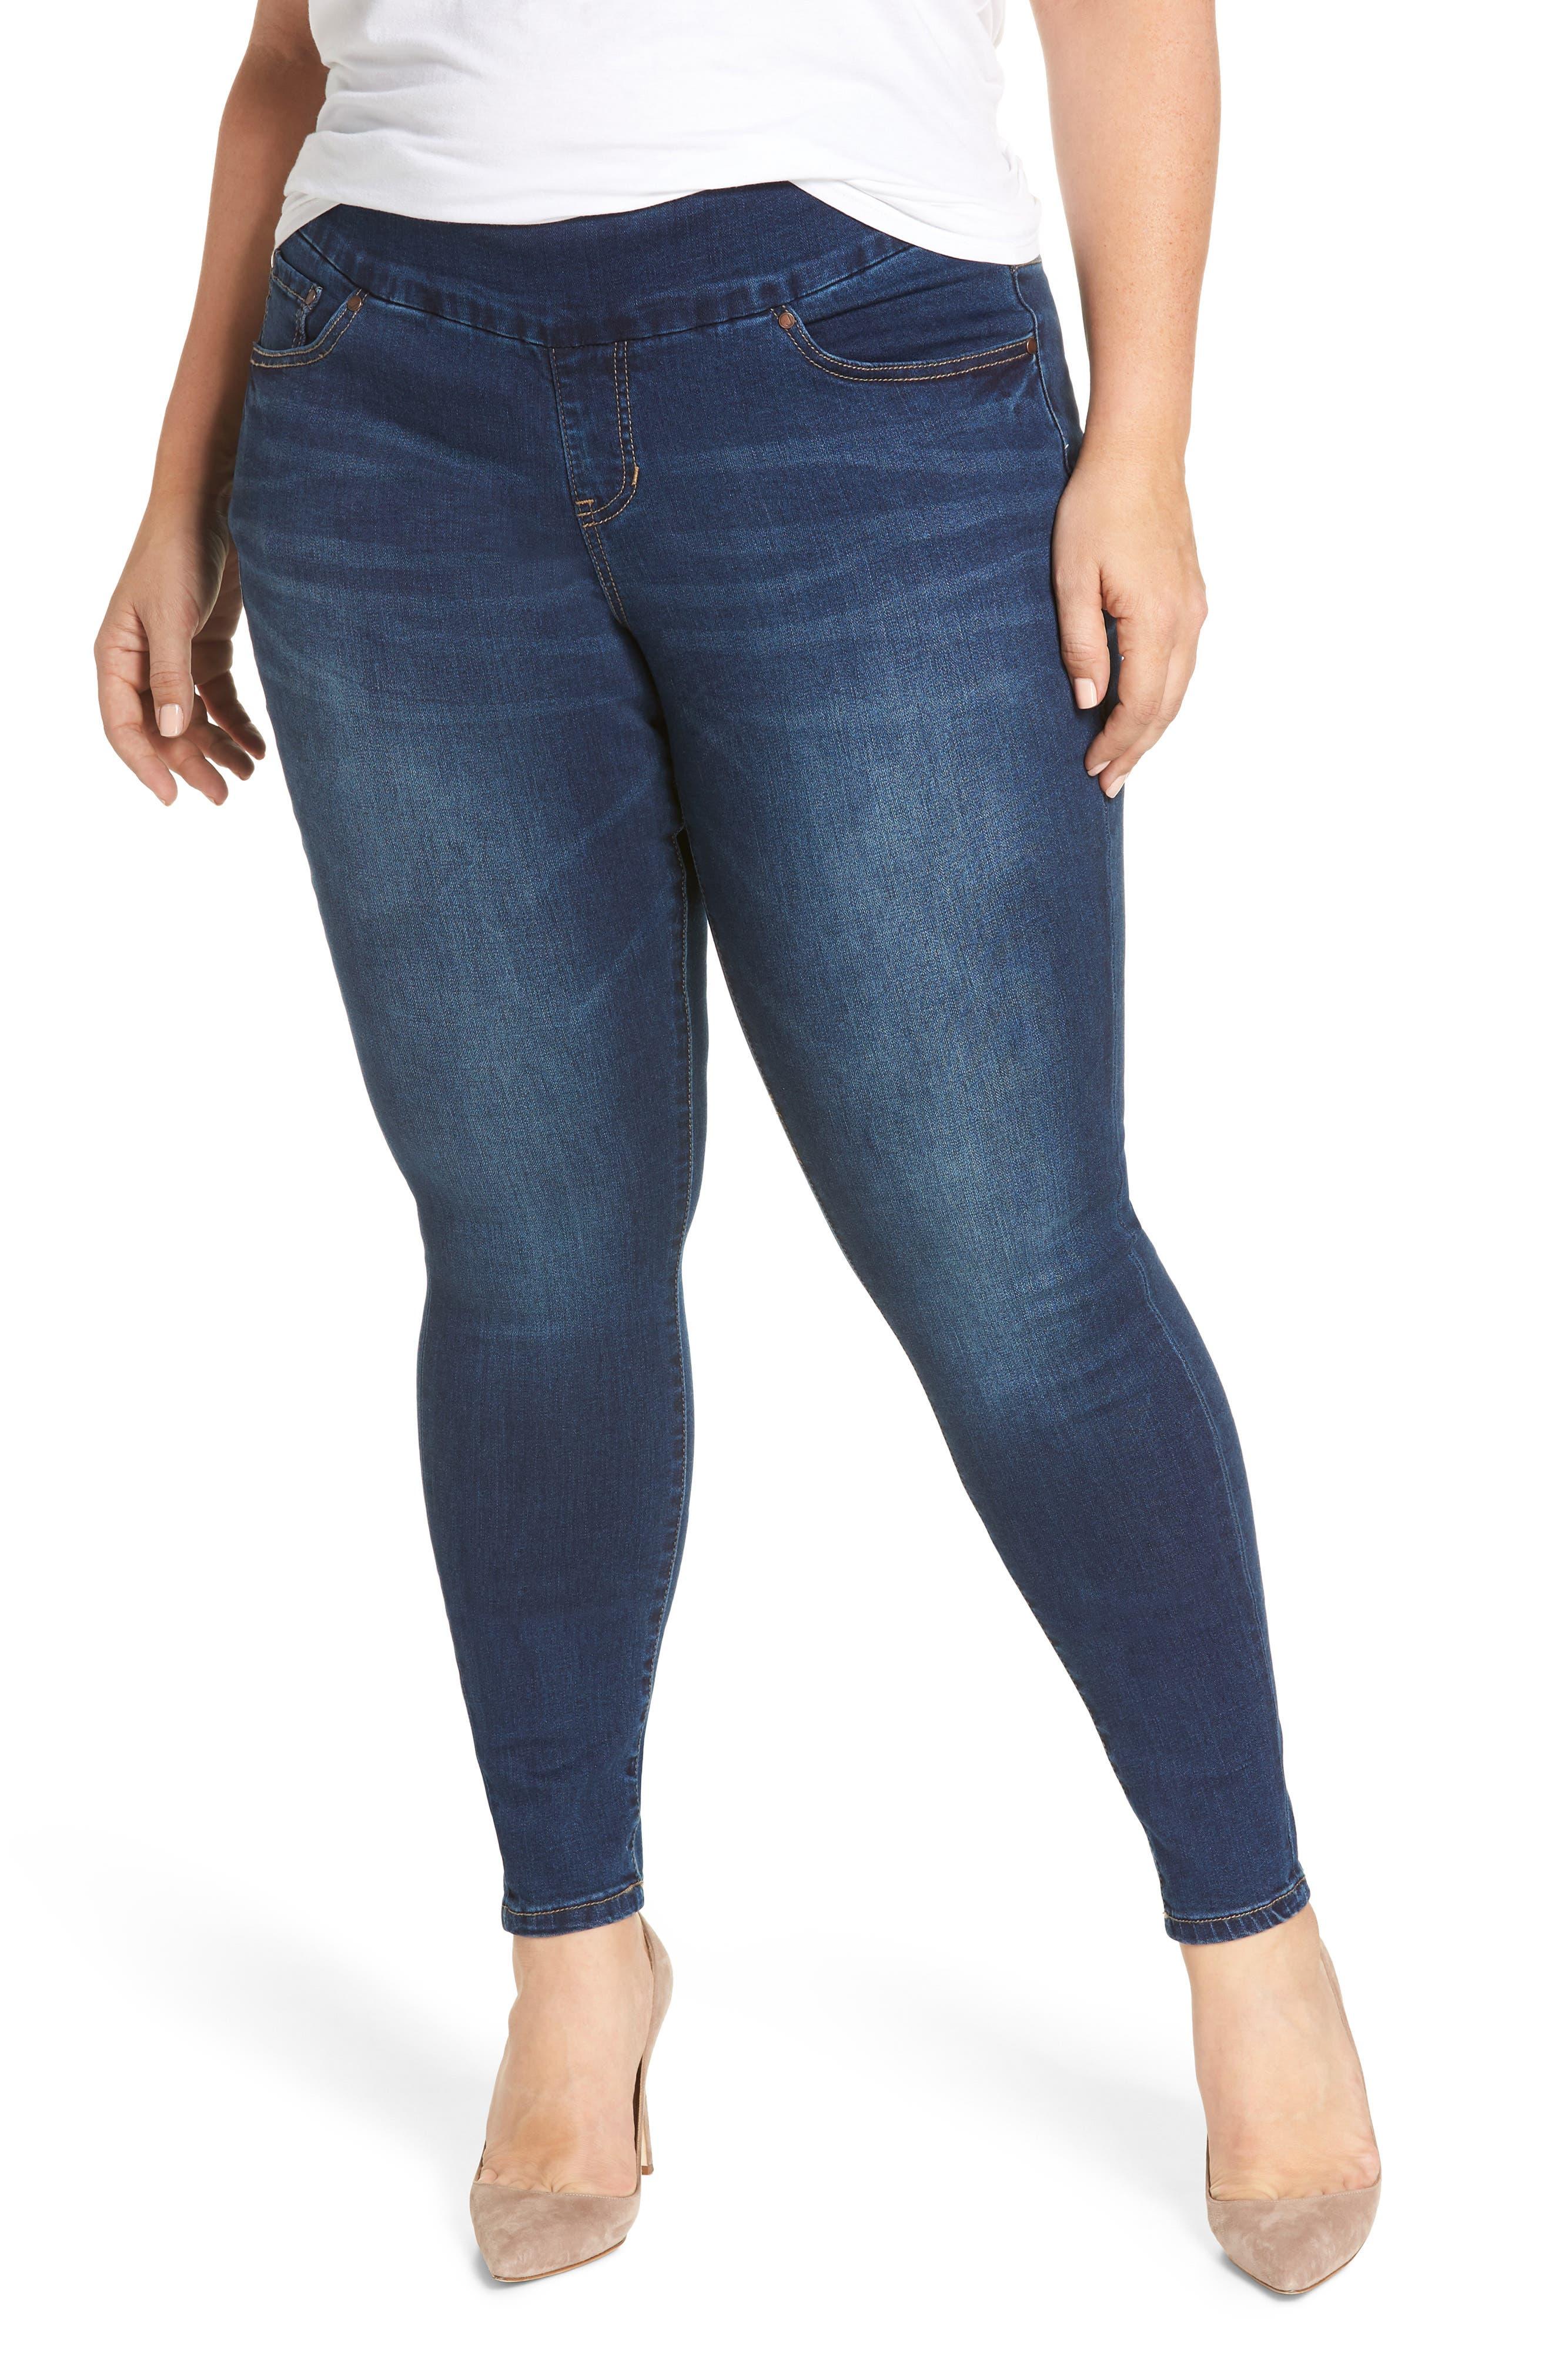 Nora Stretch Skinny Jeans,                         Main,                         color, Med Indigo